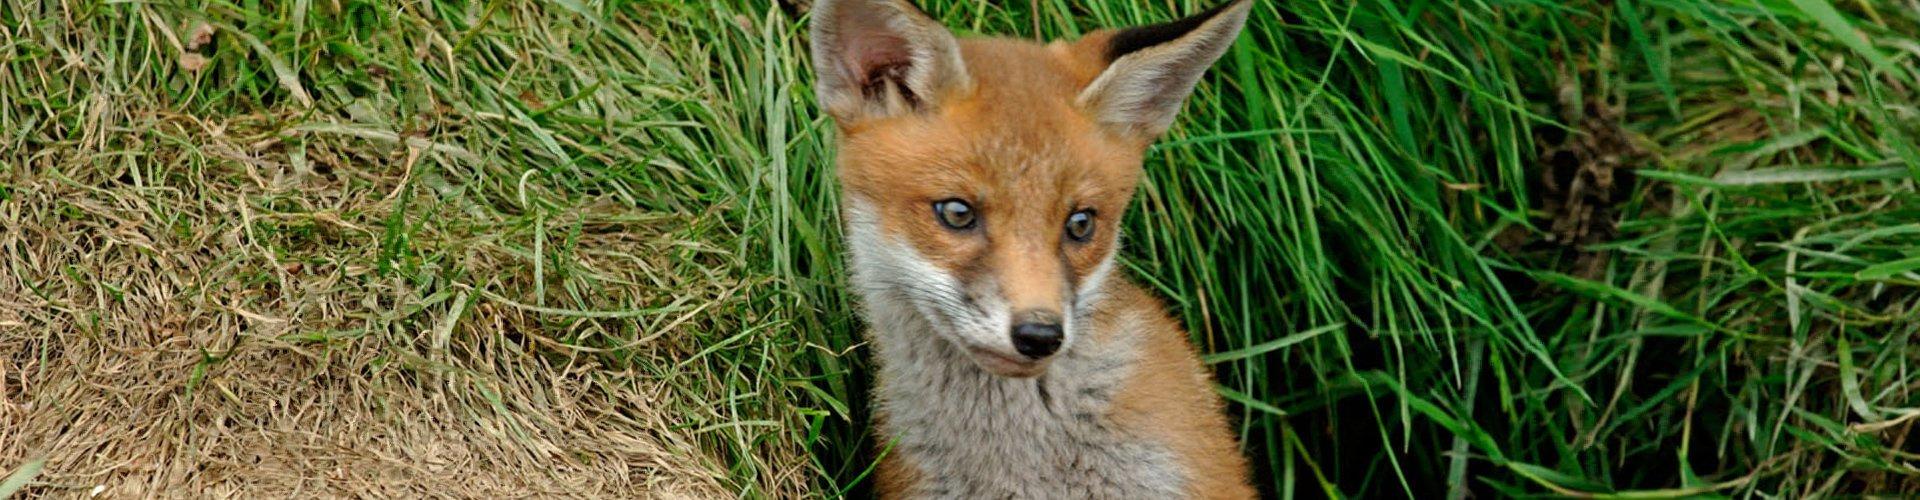 A small fox